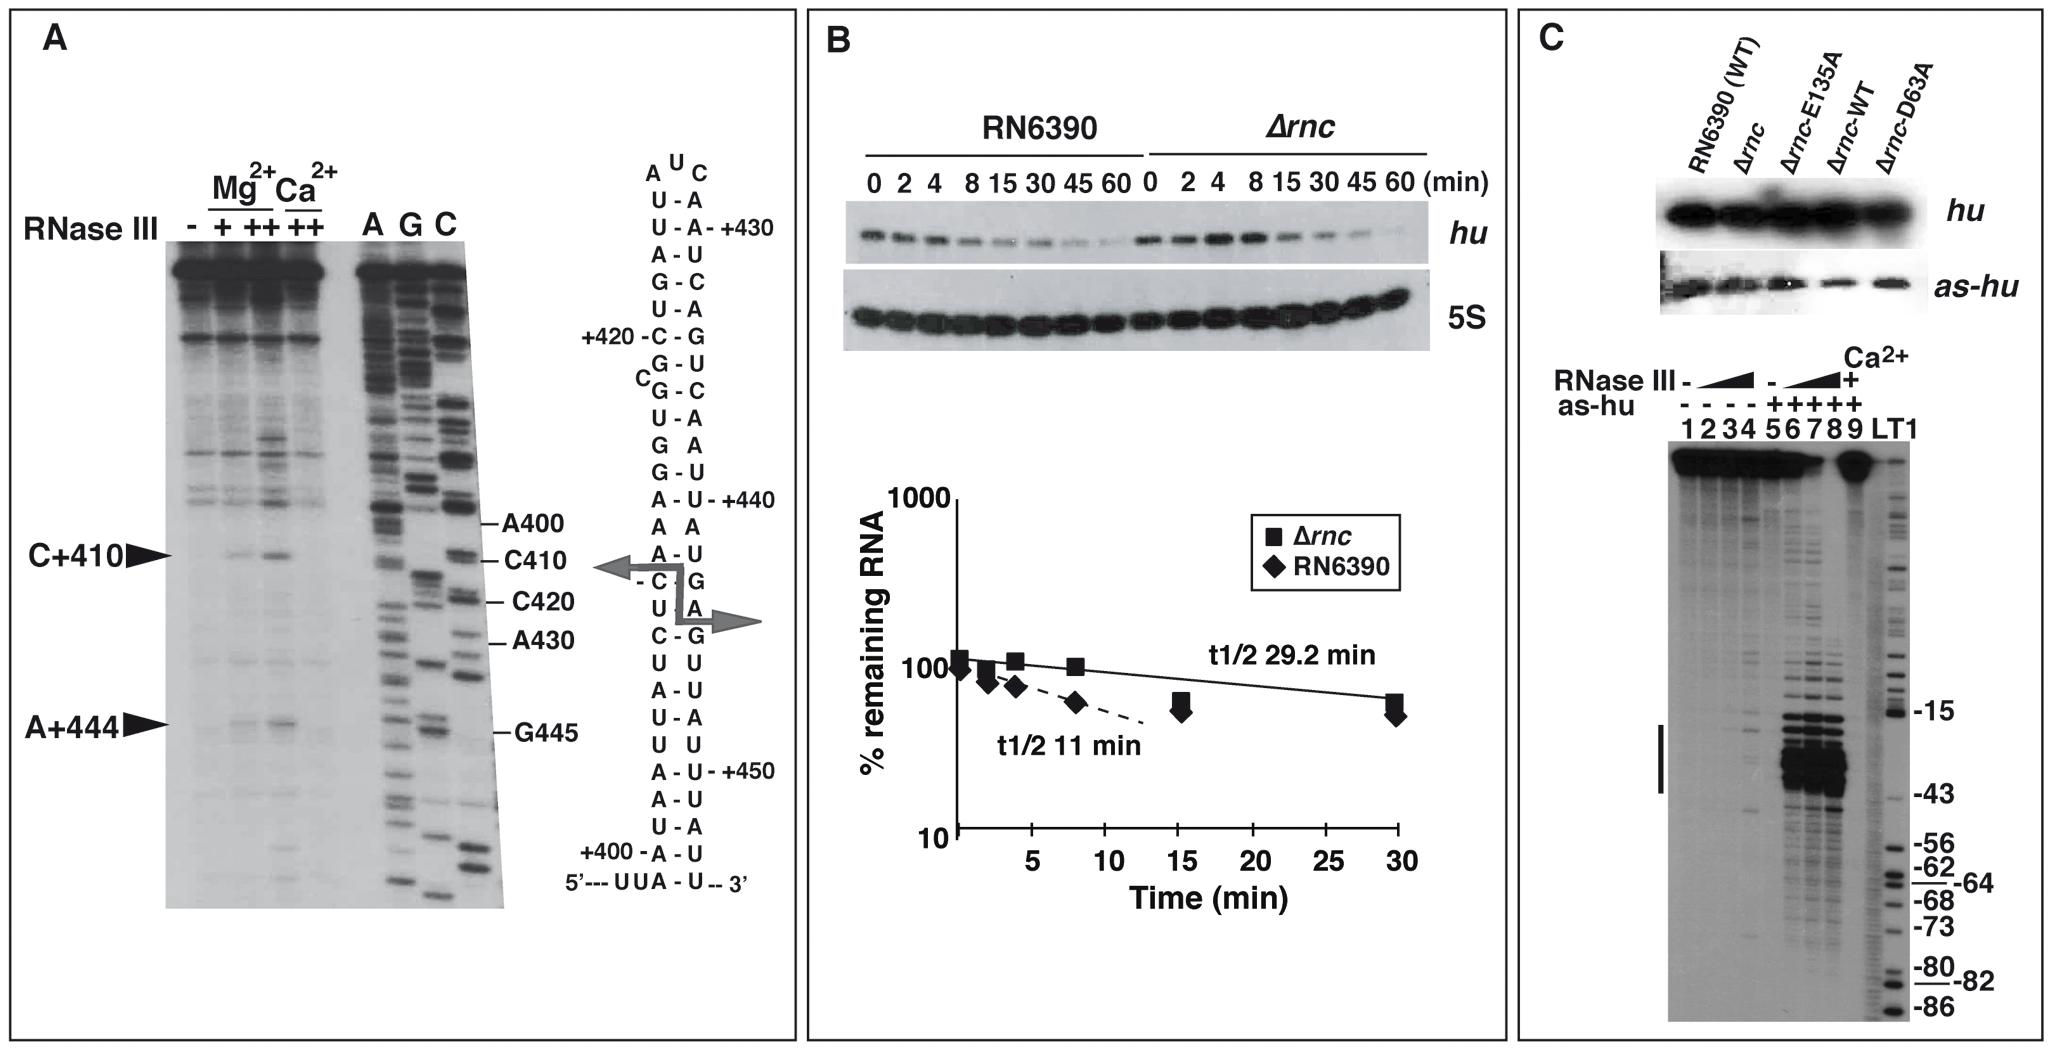 Effect of RNase III on mRNA turnover.